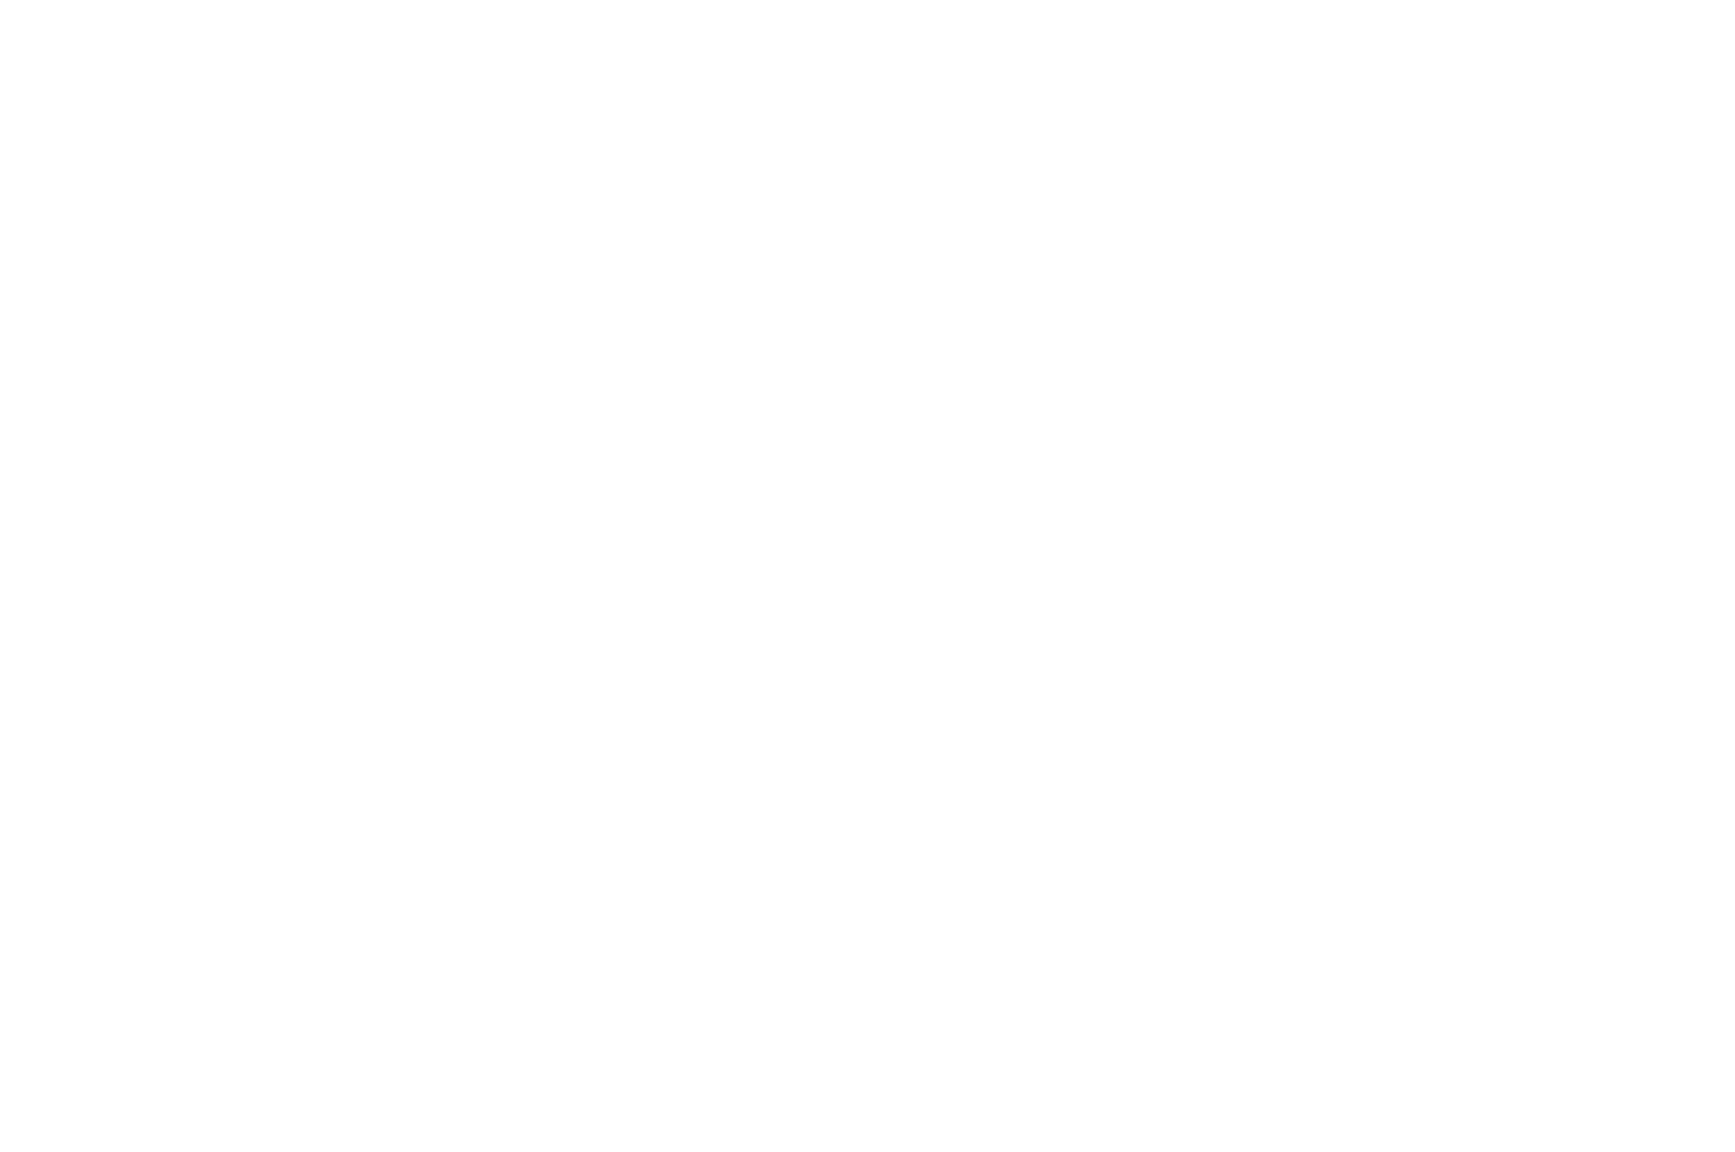 FINALIST - Bare Bones Intl Film Festival Screenplay Competition